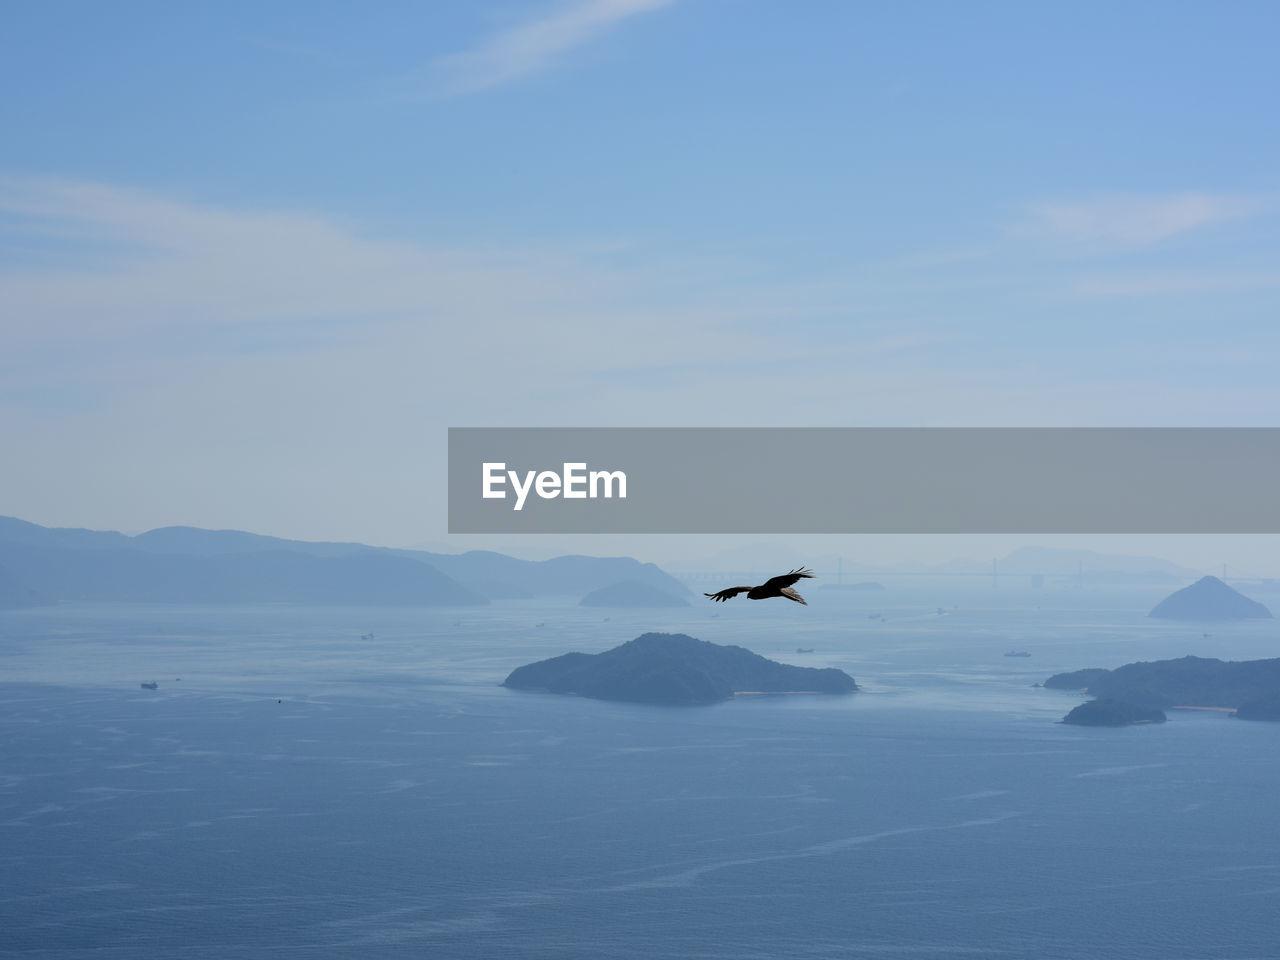 Bird flying over islands and ocean against sky